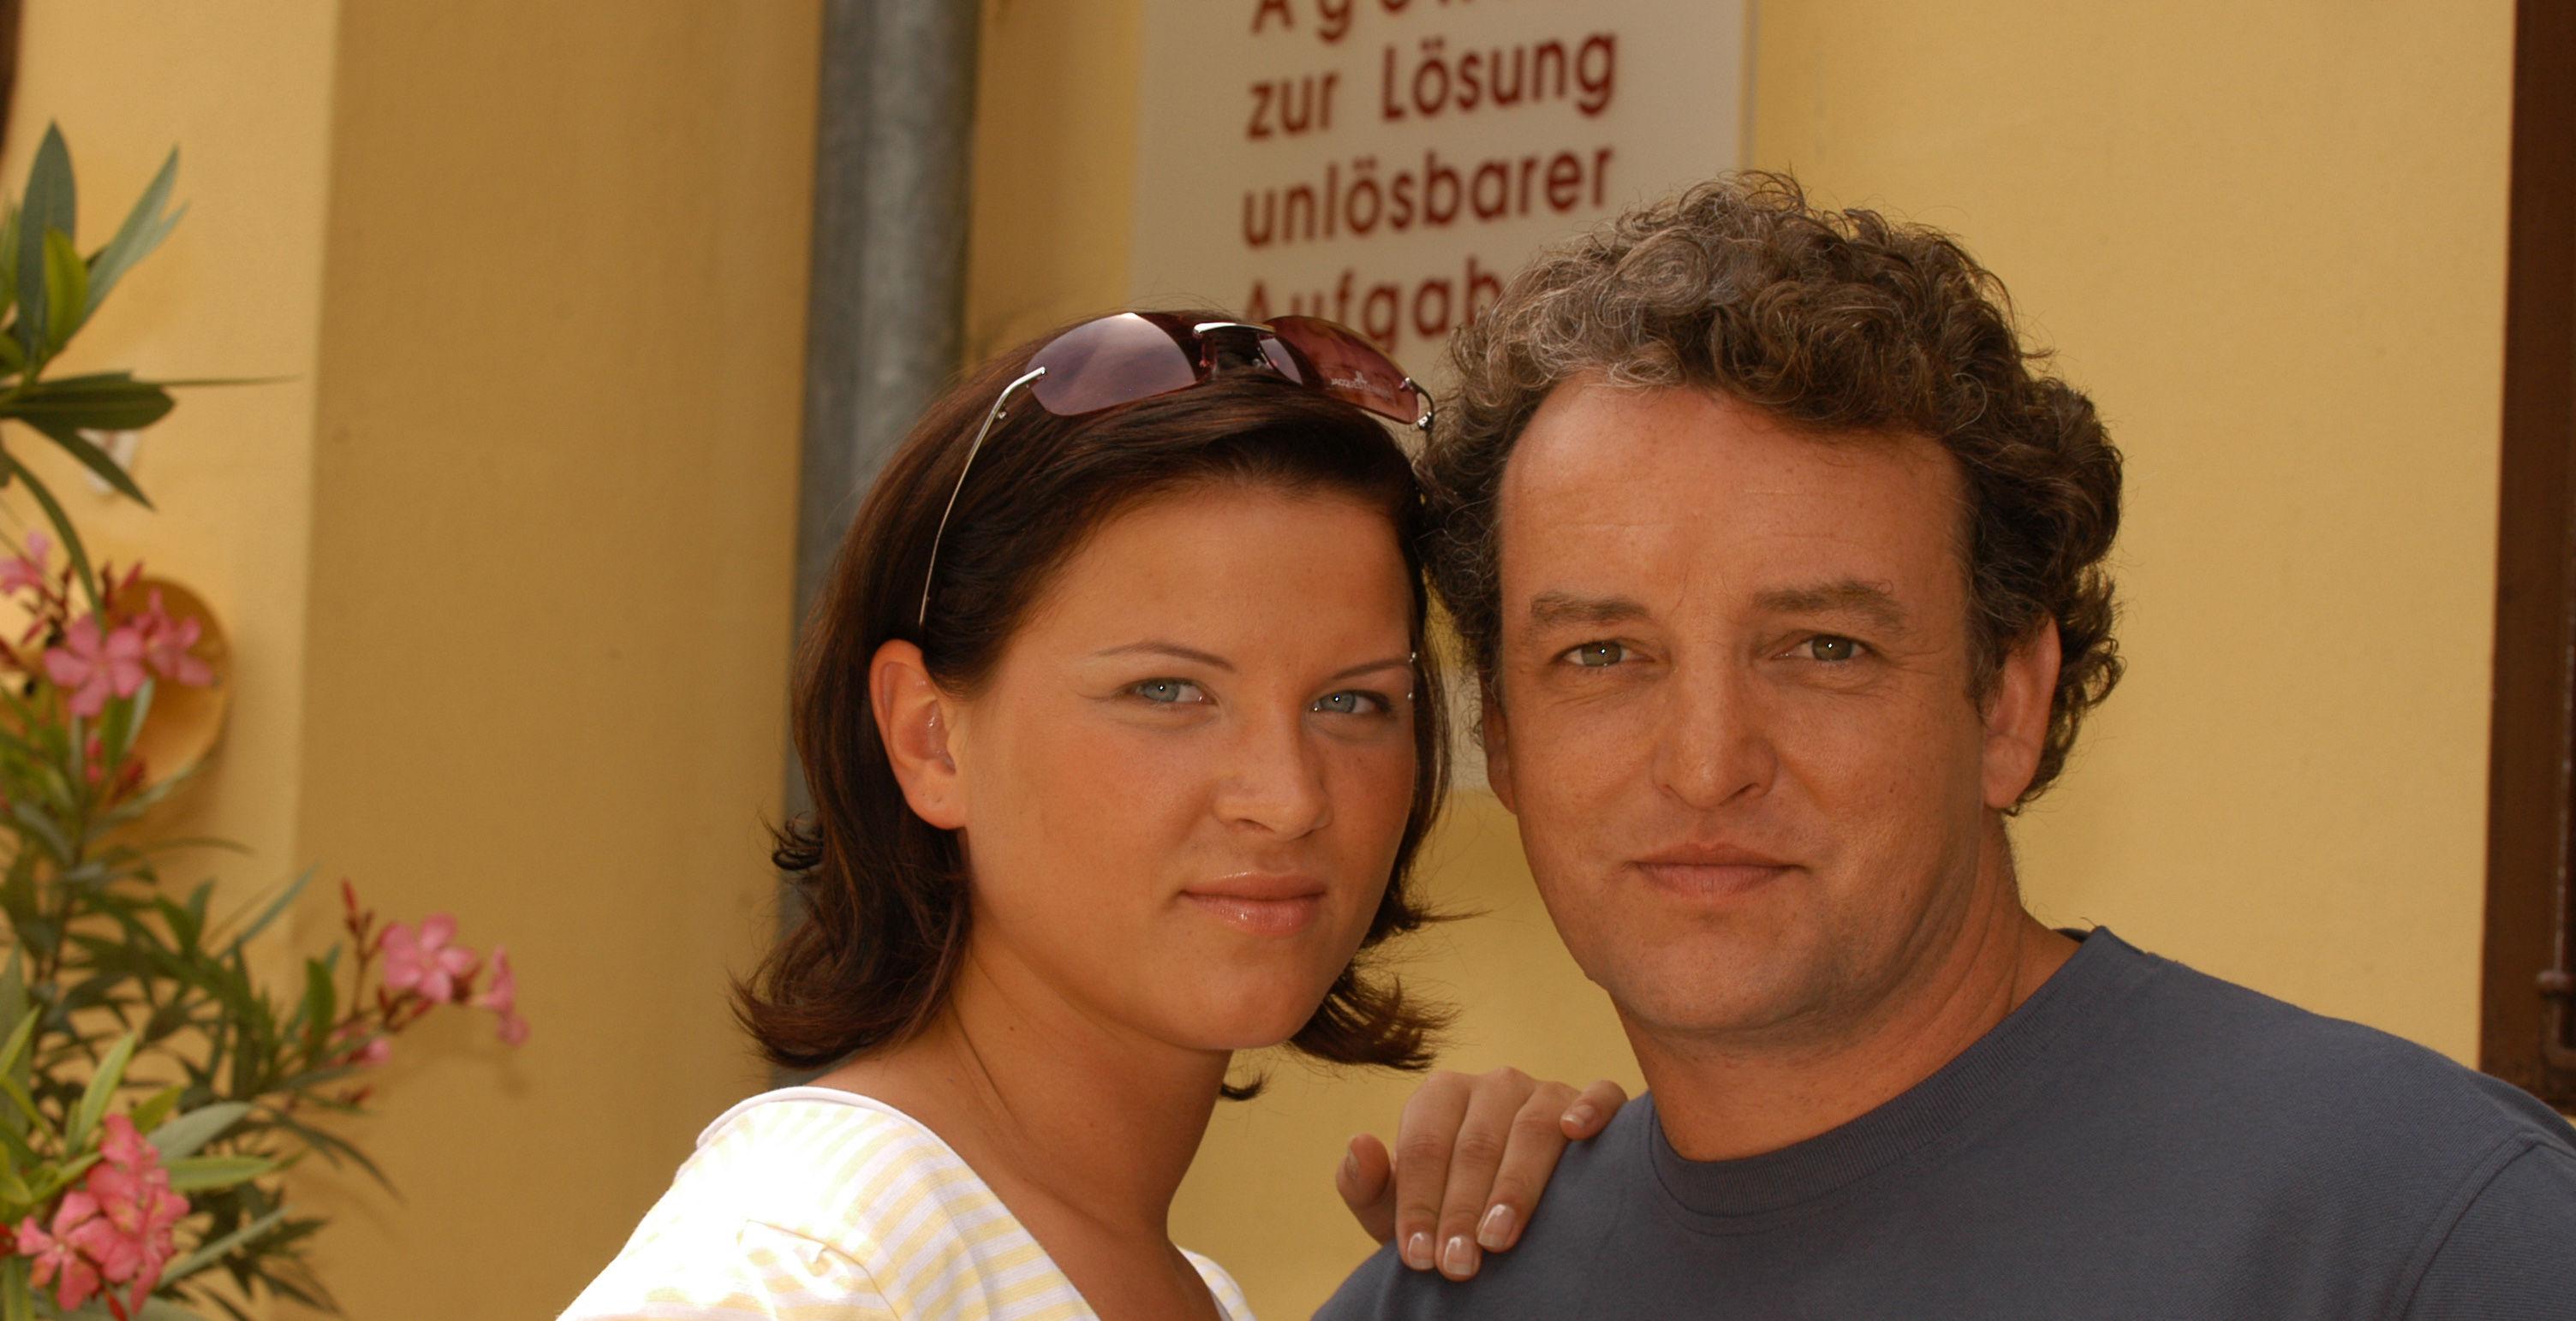 Shark (Magdalena Rentenberger), Freddy (Marco Rima)